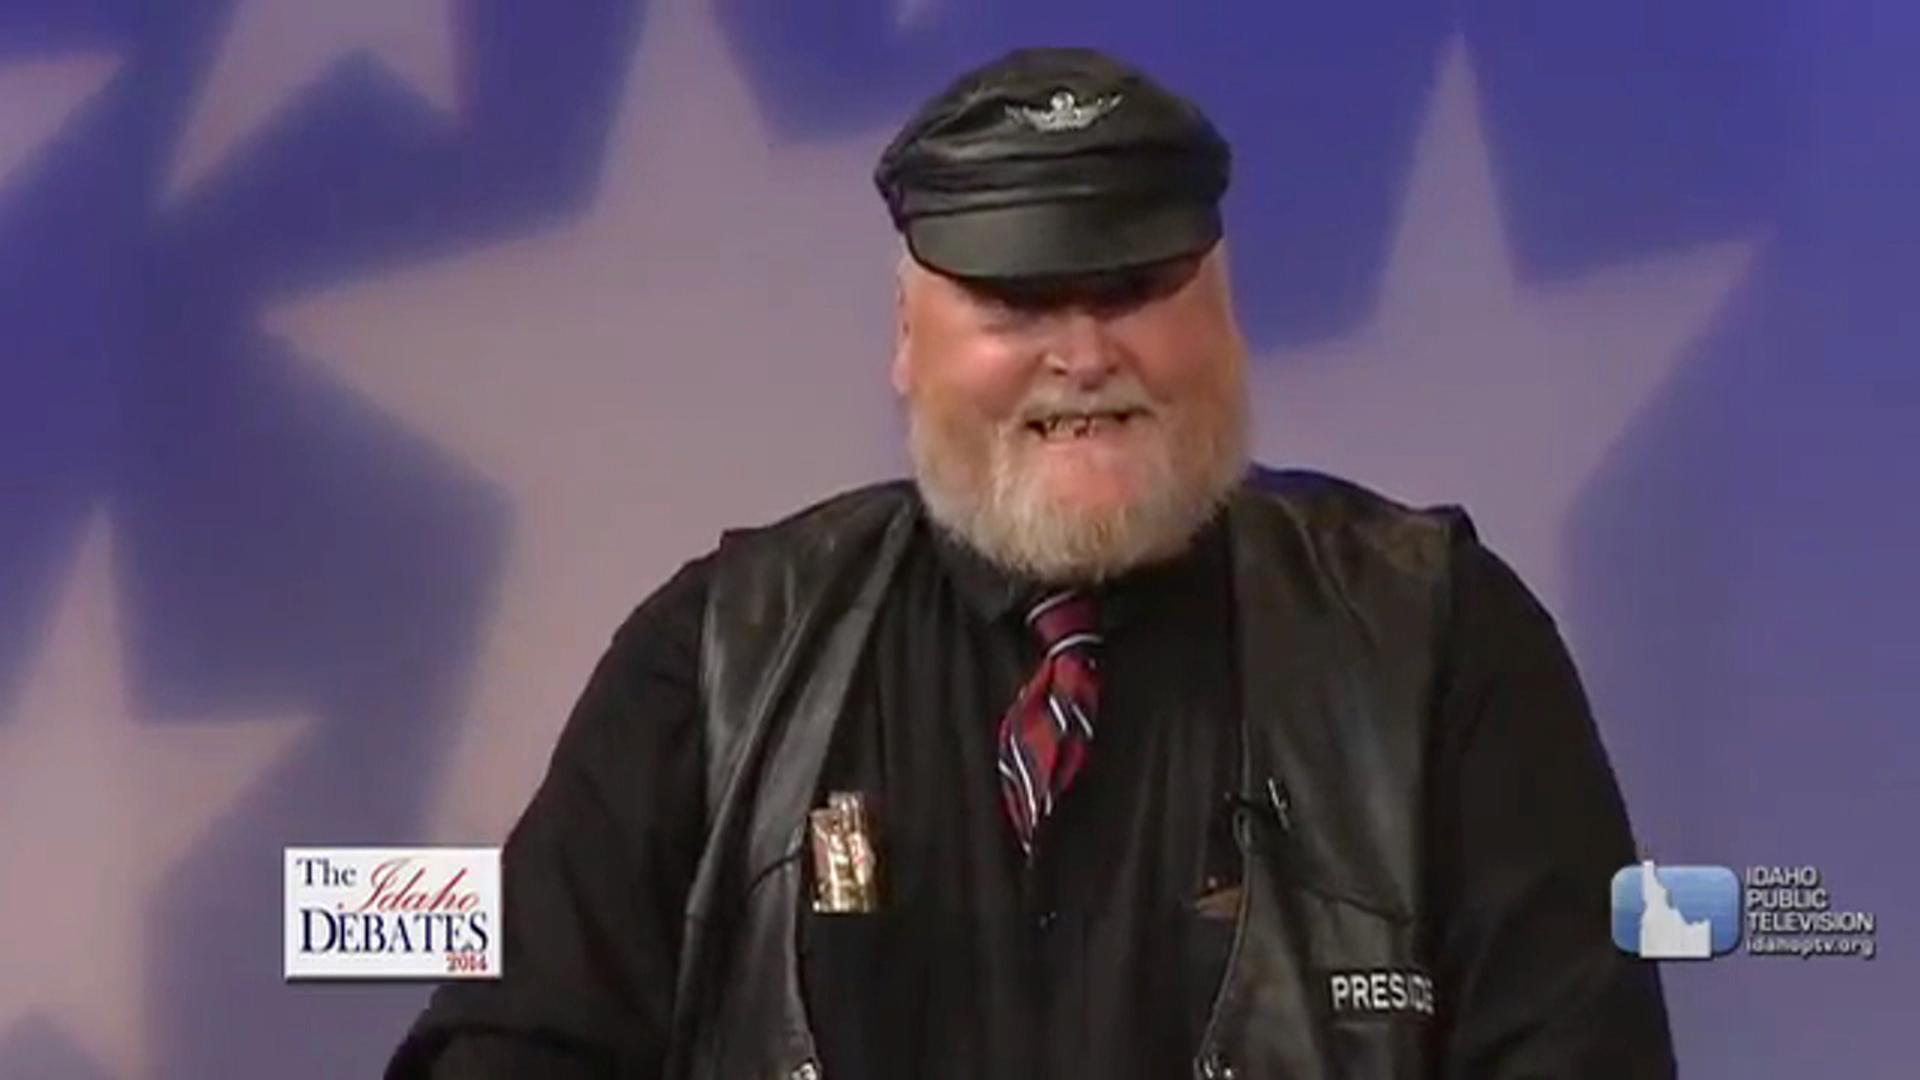 A biker, a cowboy and Idaho's best debate...